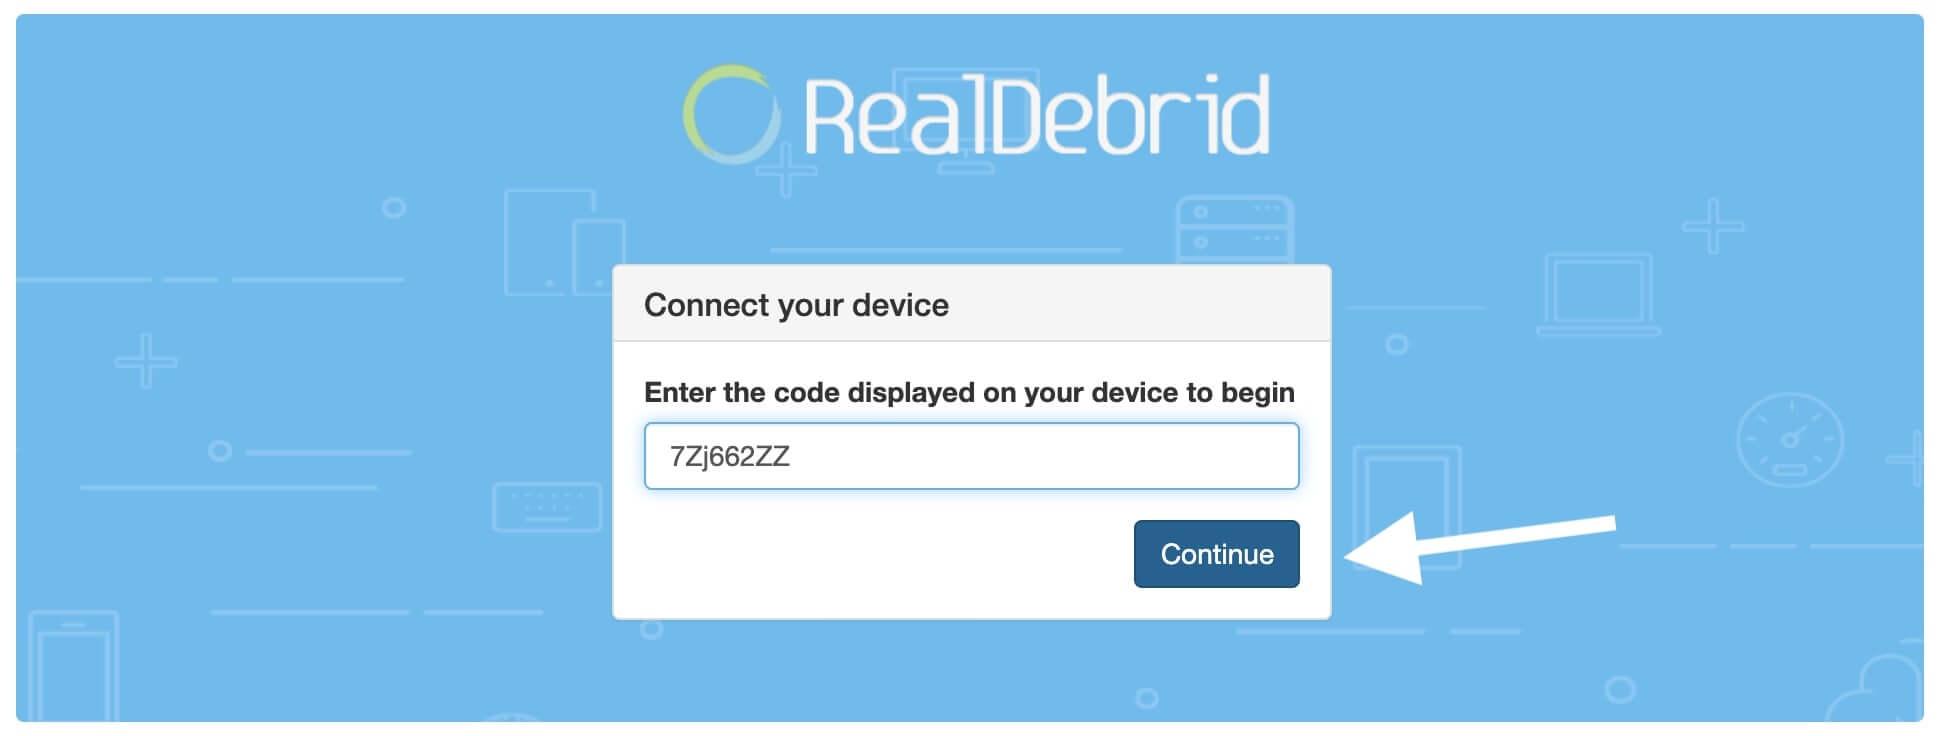 Real-debrid-and-Weyd-Apk-on-Firestick-4K